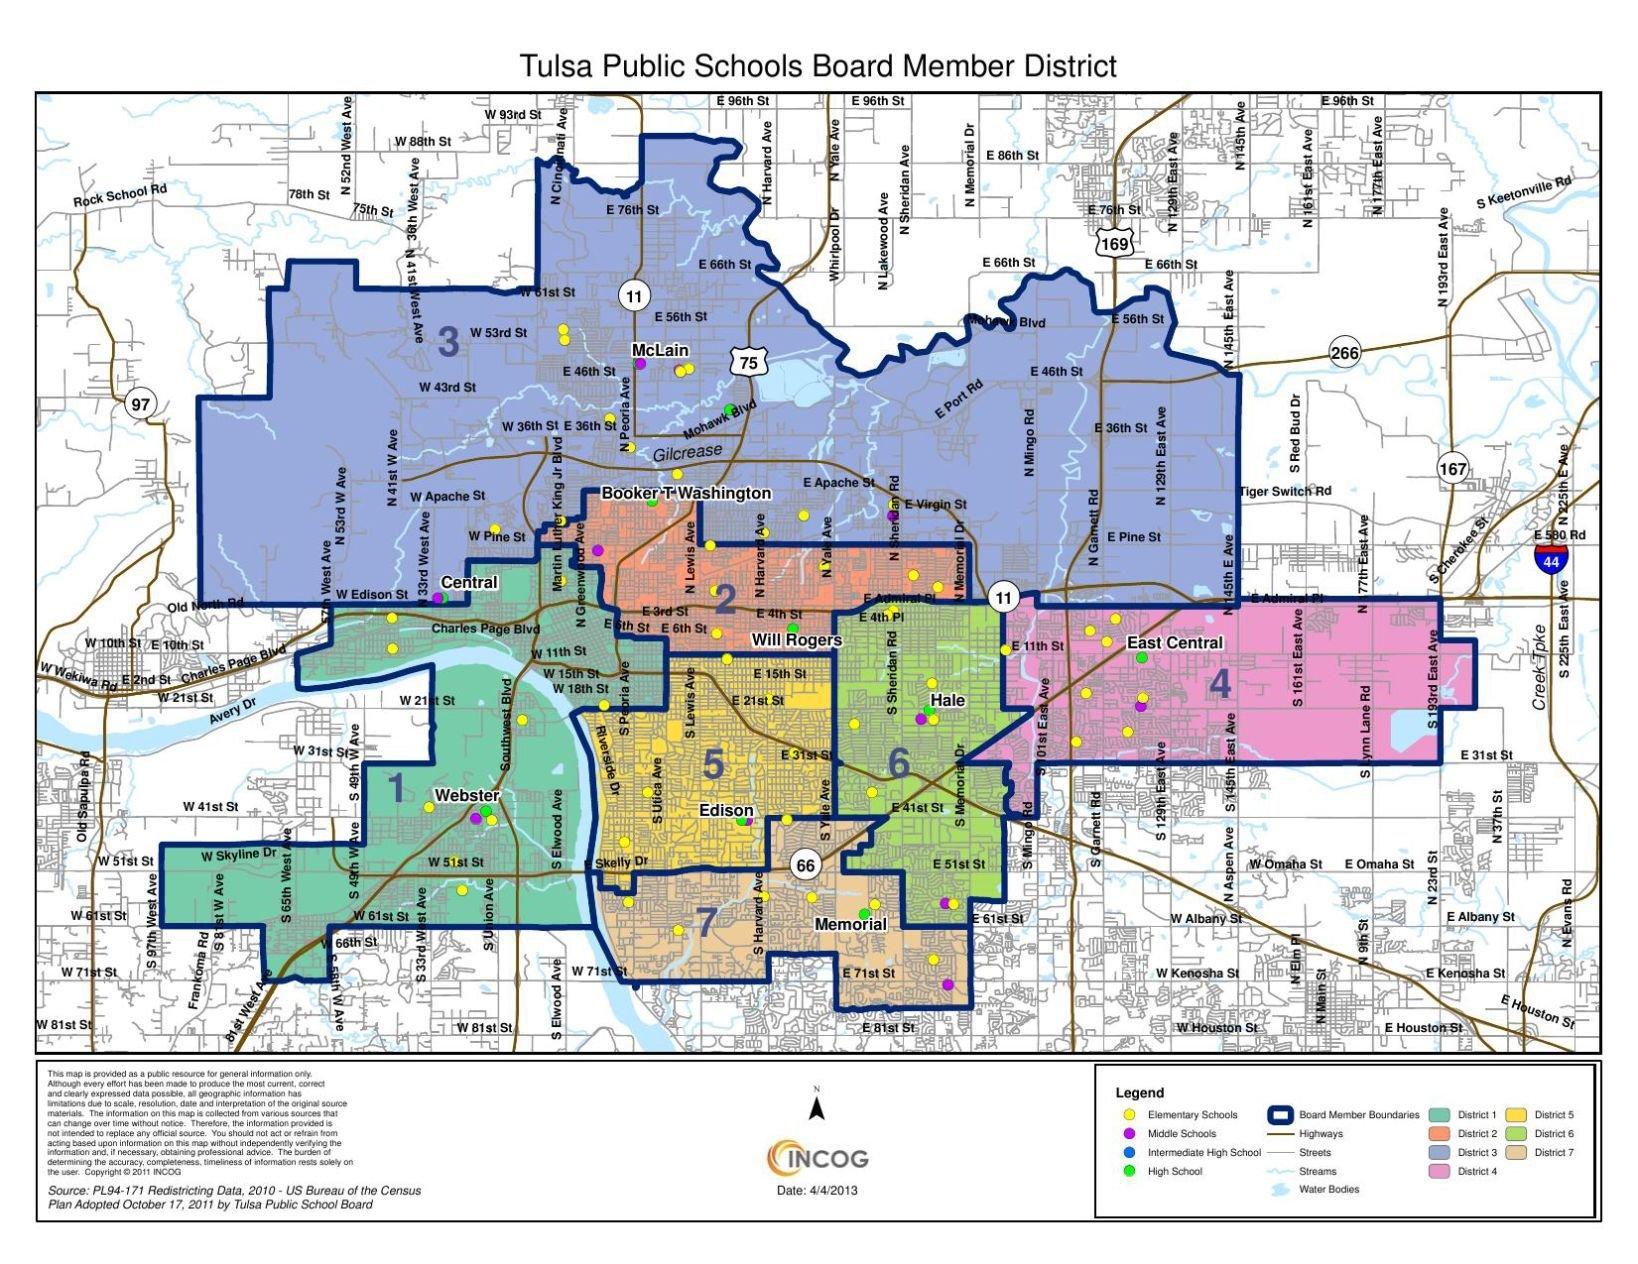 Tulsa Public Schools district boundary map tulsaworldcom